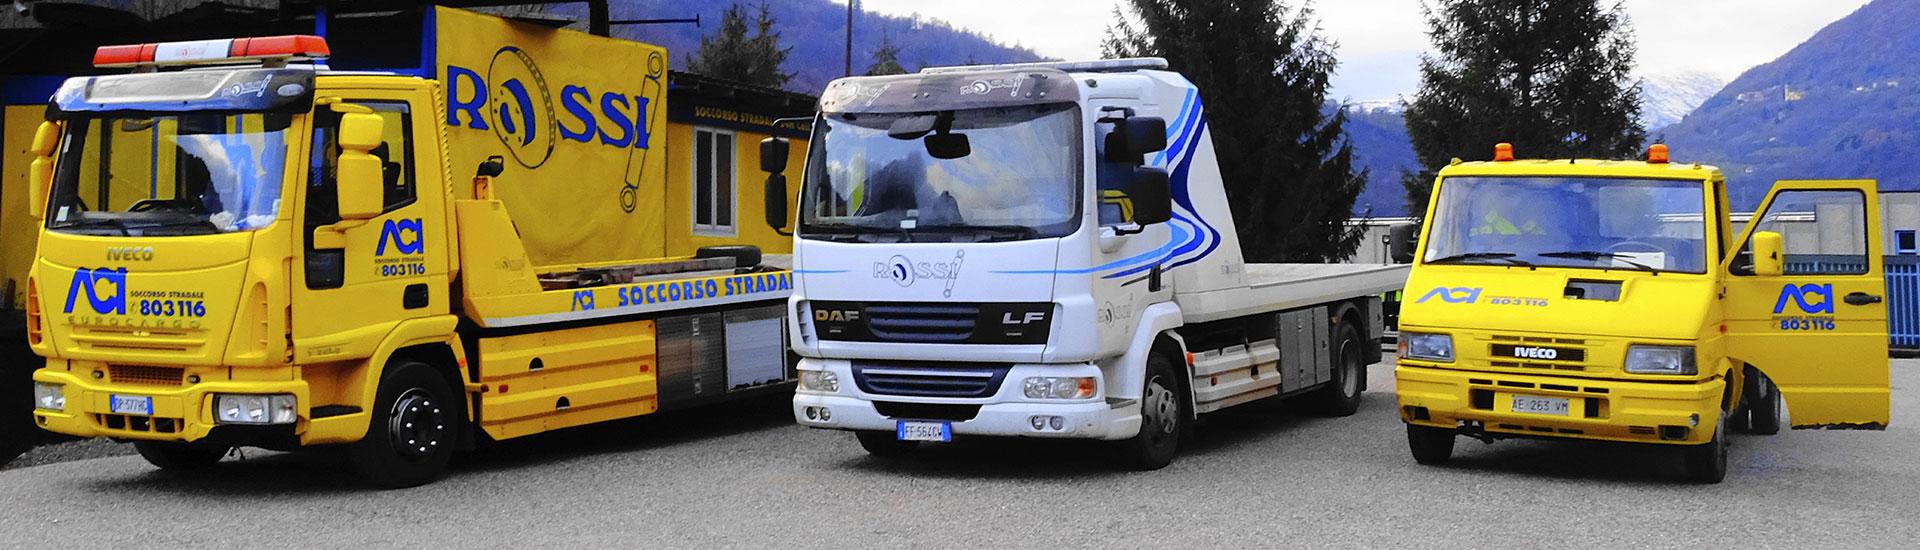 Autosoccorso | Rossi Racing